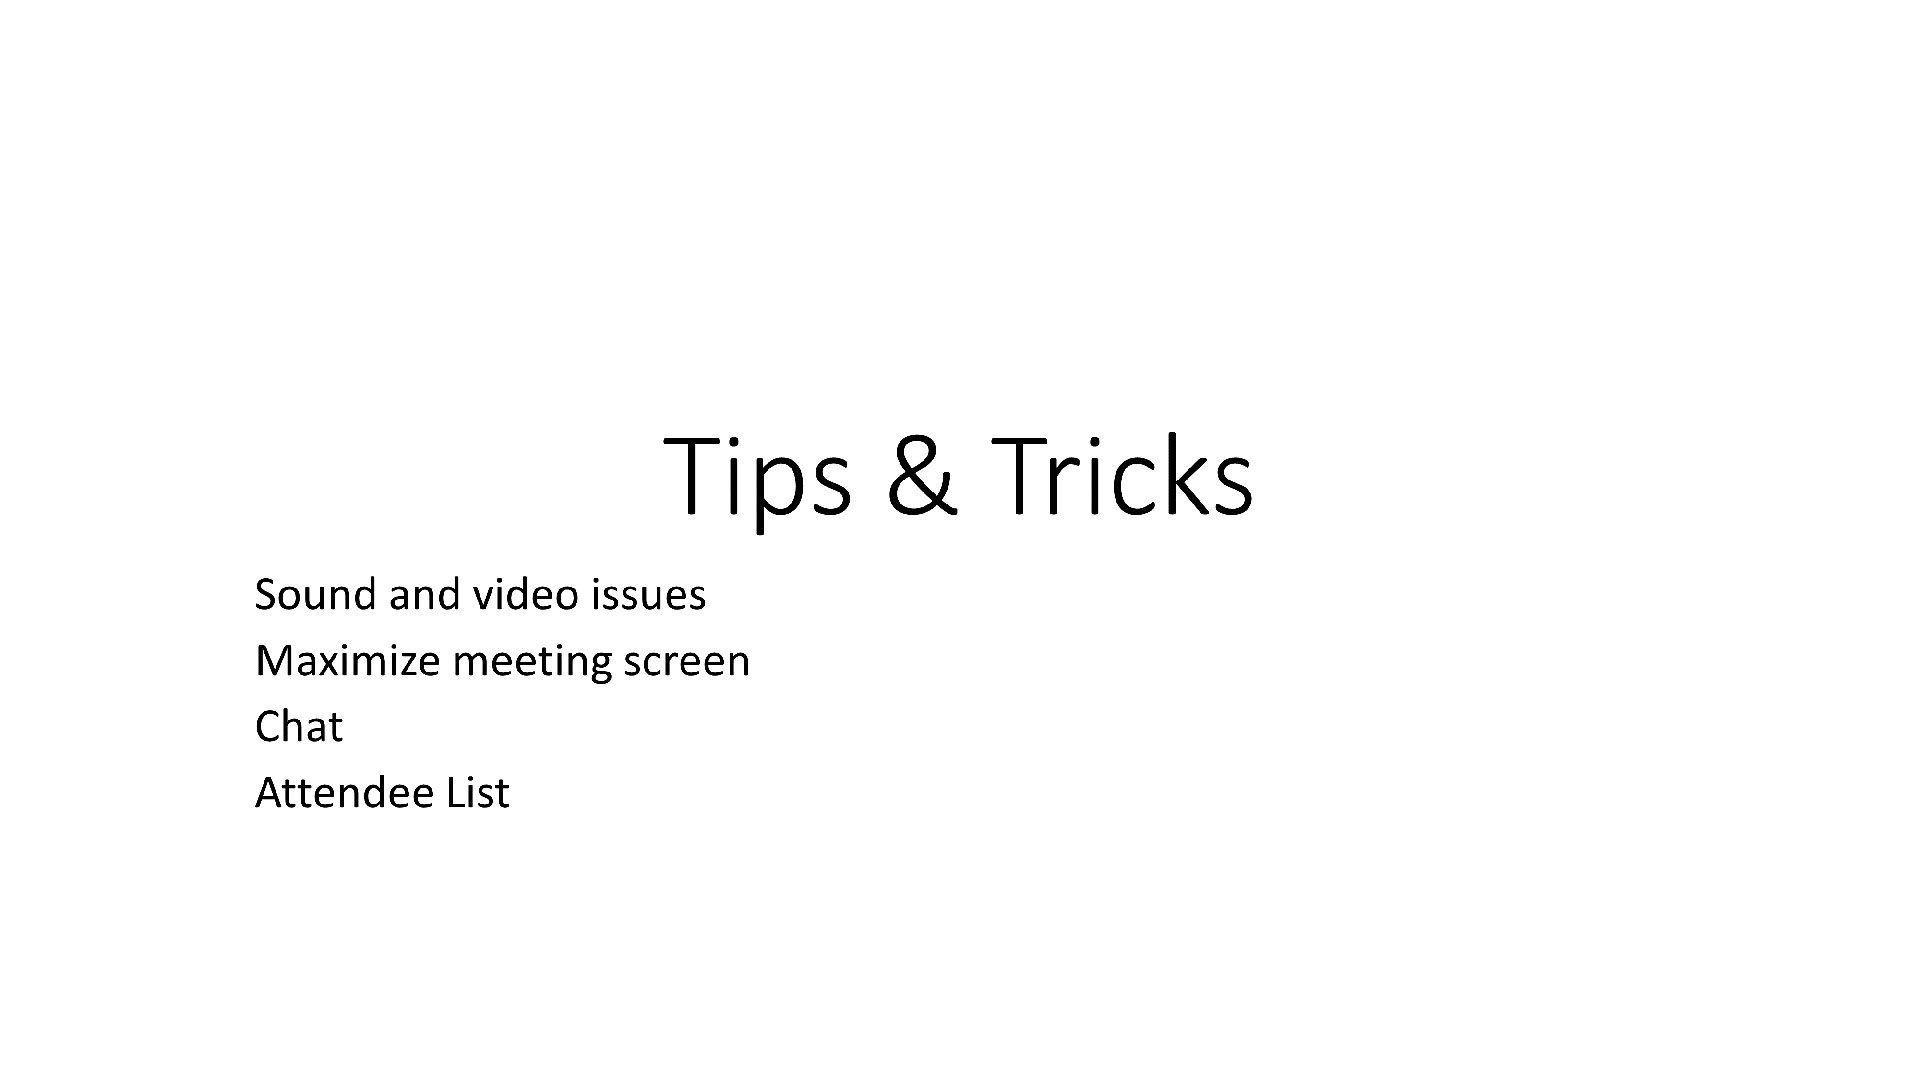 Virtual-Meeting-Tips-and-Tricks-09